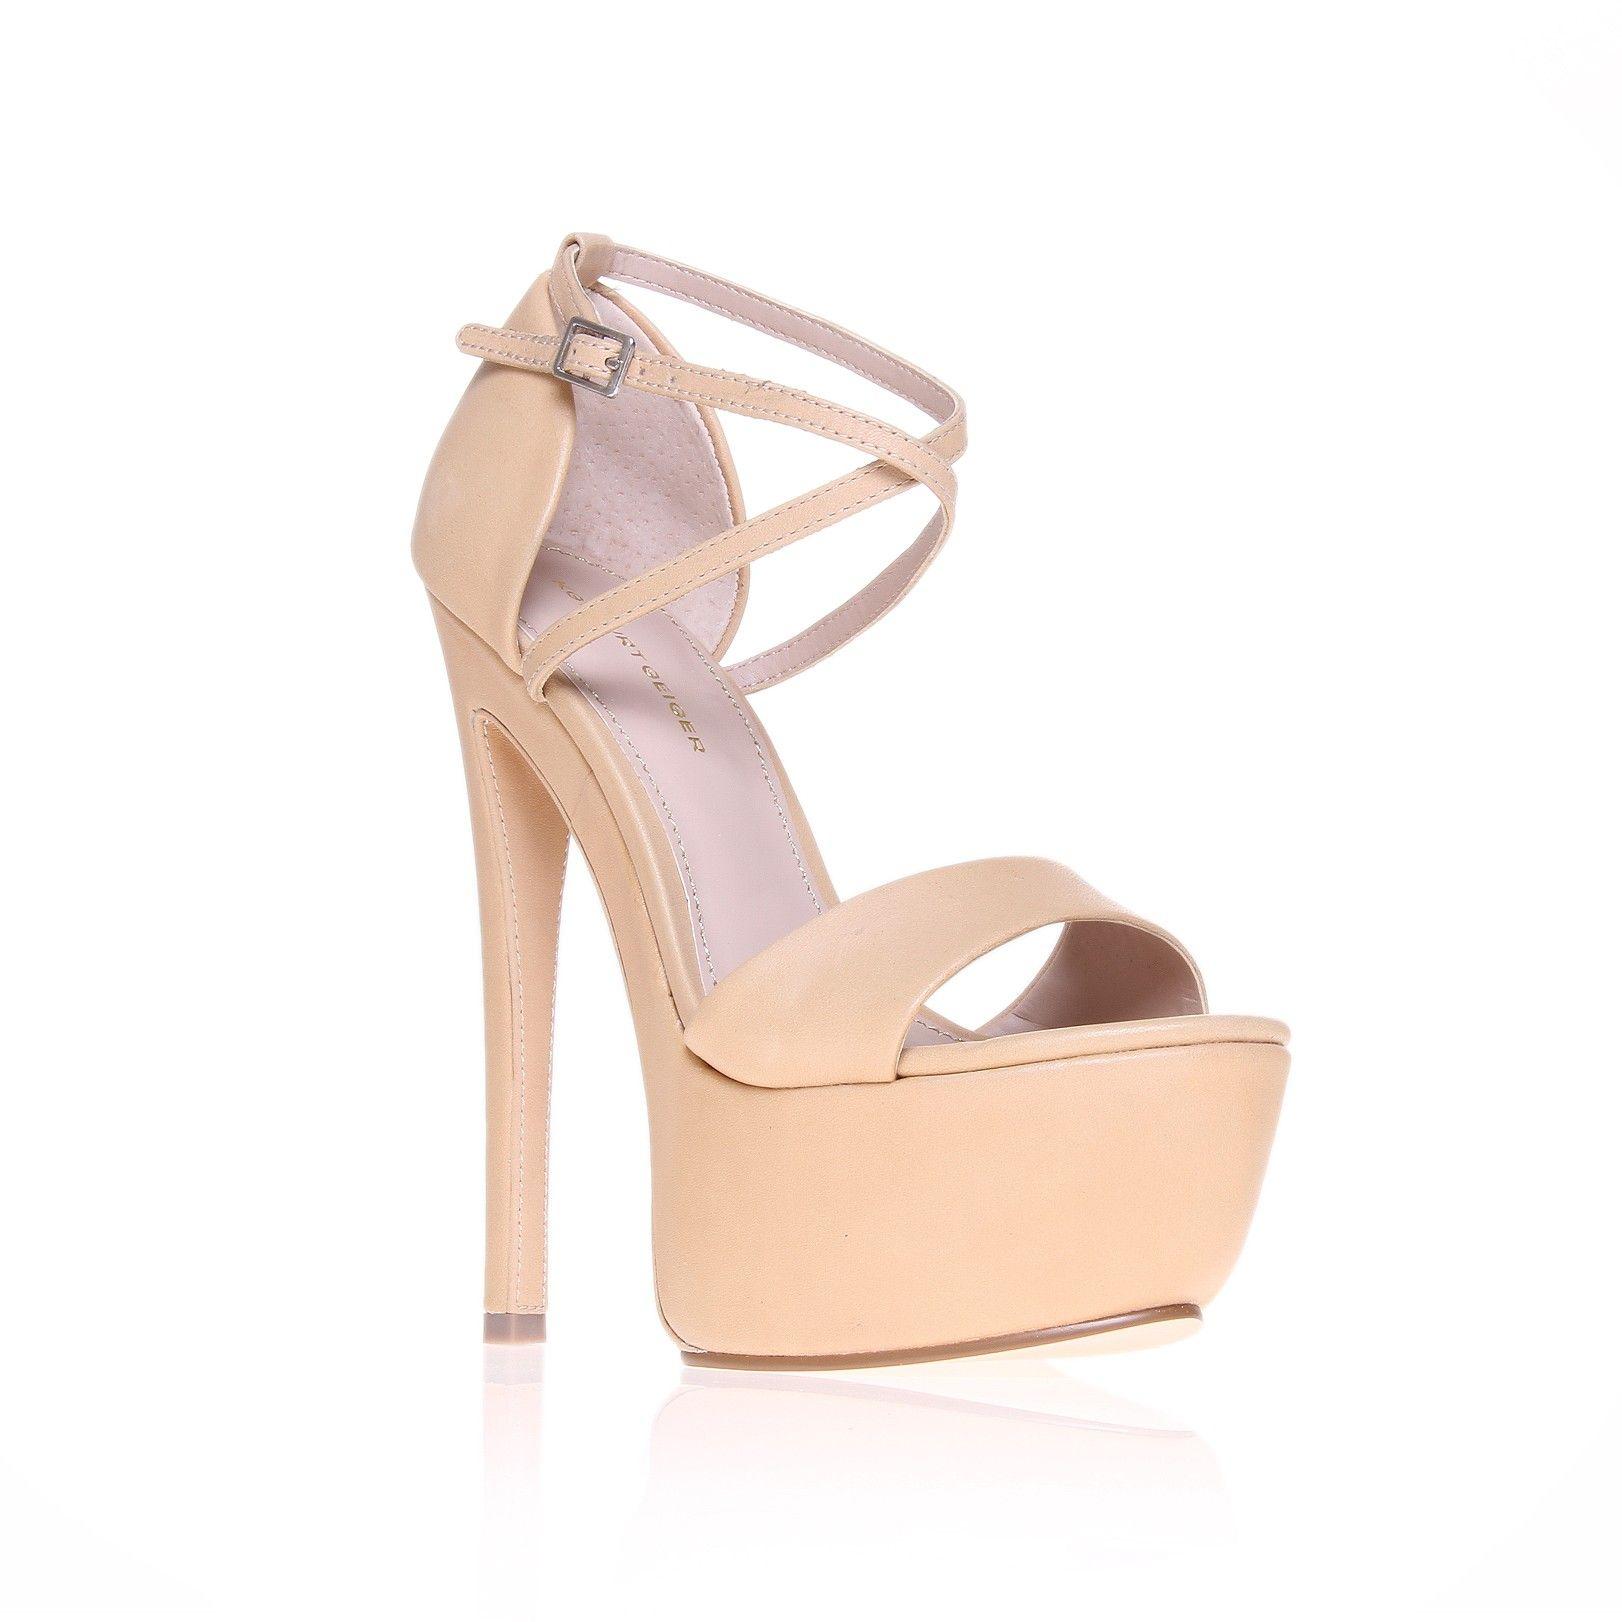 nanette, nude shoe by kg kurt geiger - women shoes platforms 6 inch